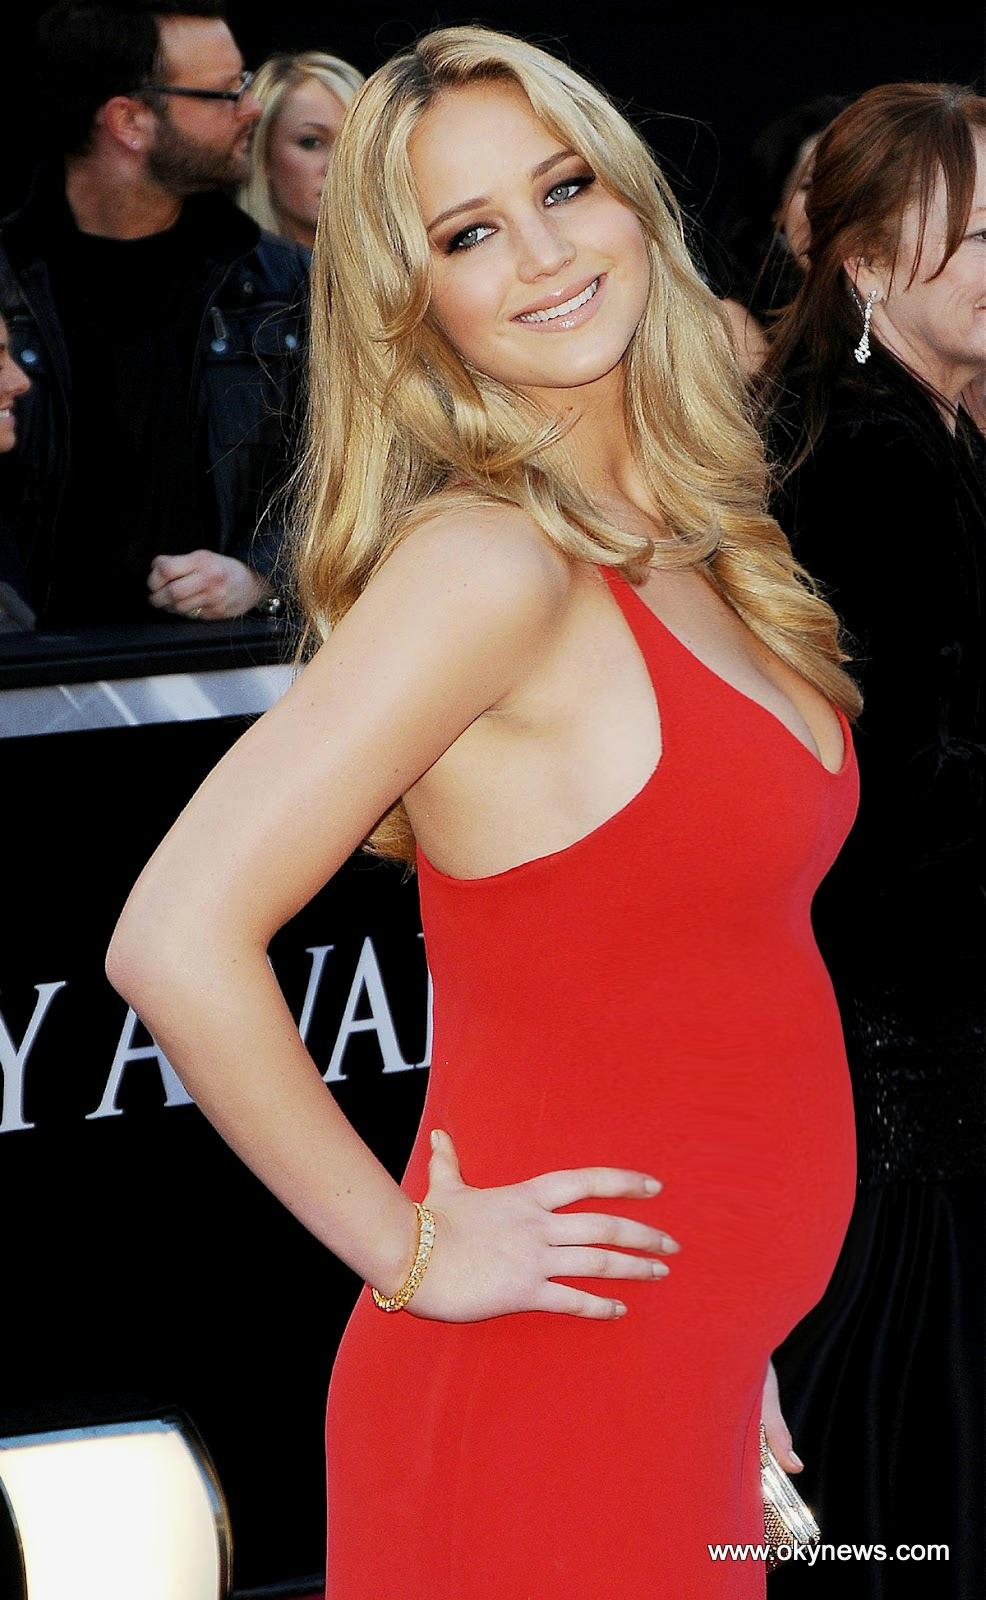 Jennifer Lawrence Pregnant Pregnant Jen by montyisfatJennifer Lawrence Pregnant